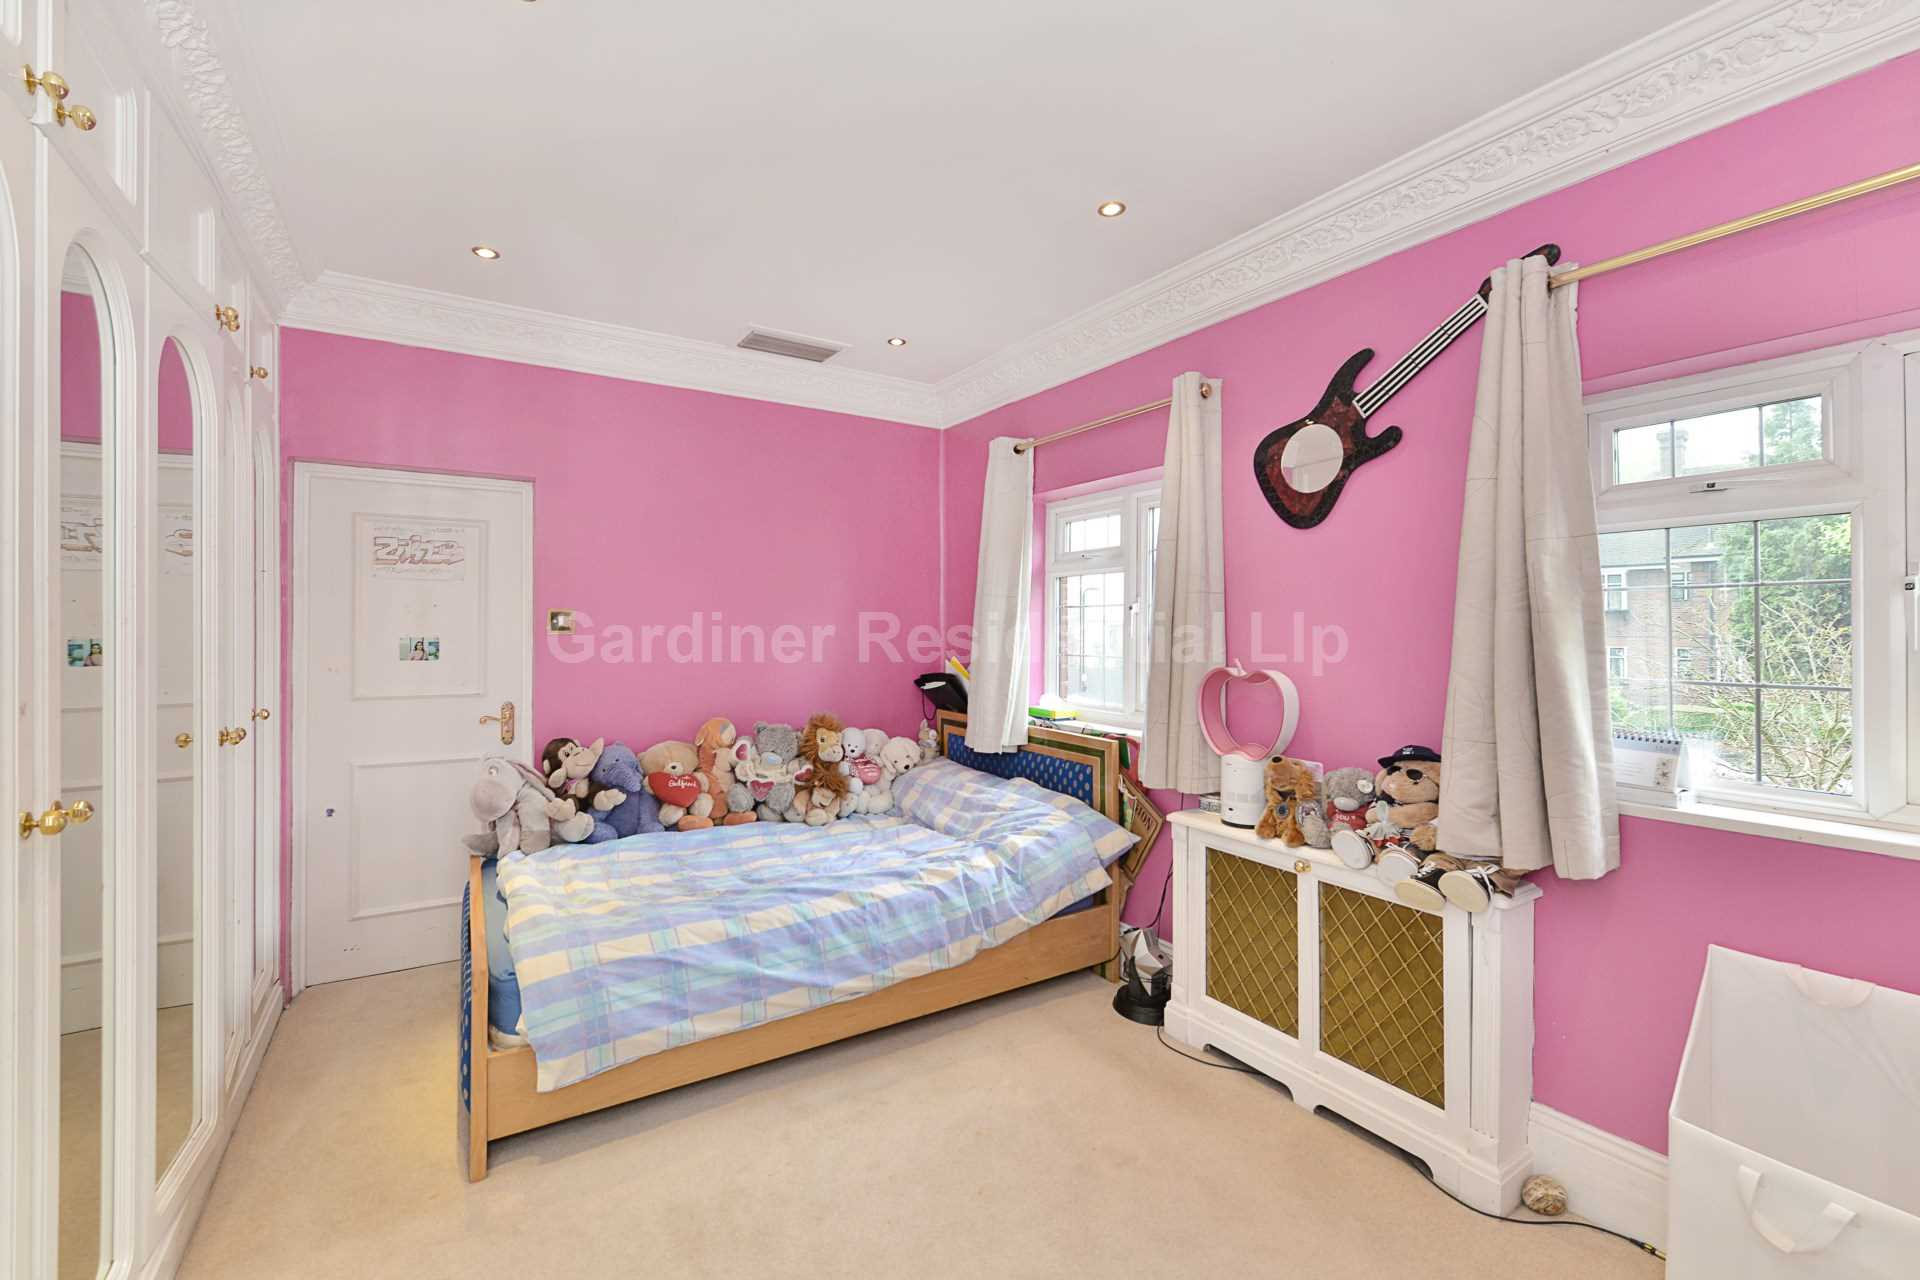 http://www.brightlogic-estateagents.co.uk/GARD/upload//4-16.jpg